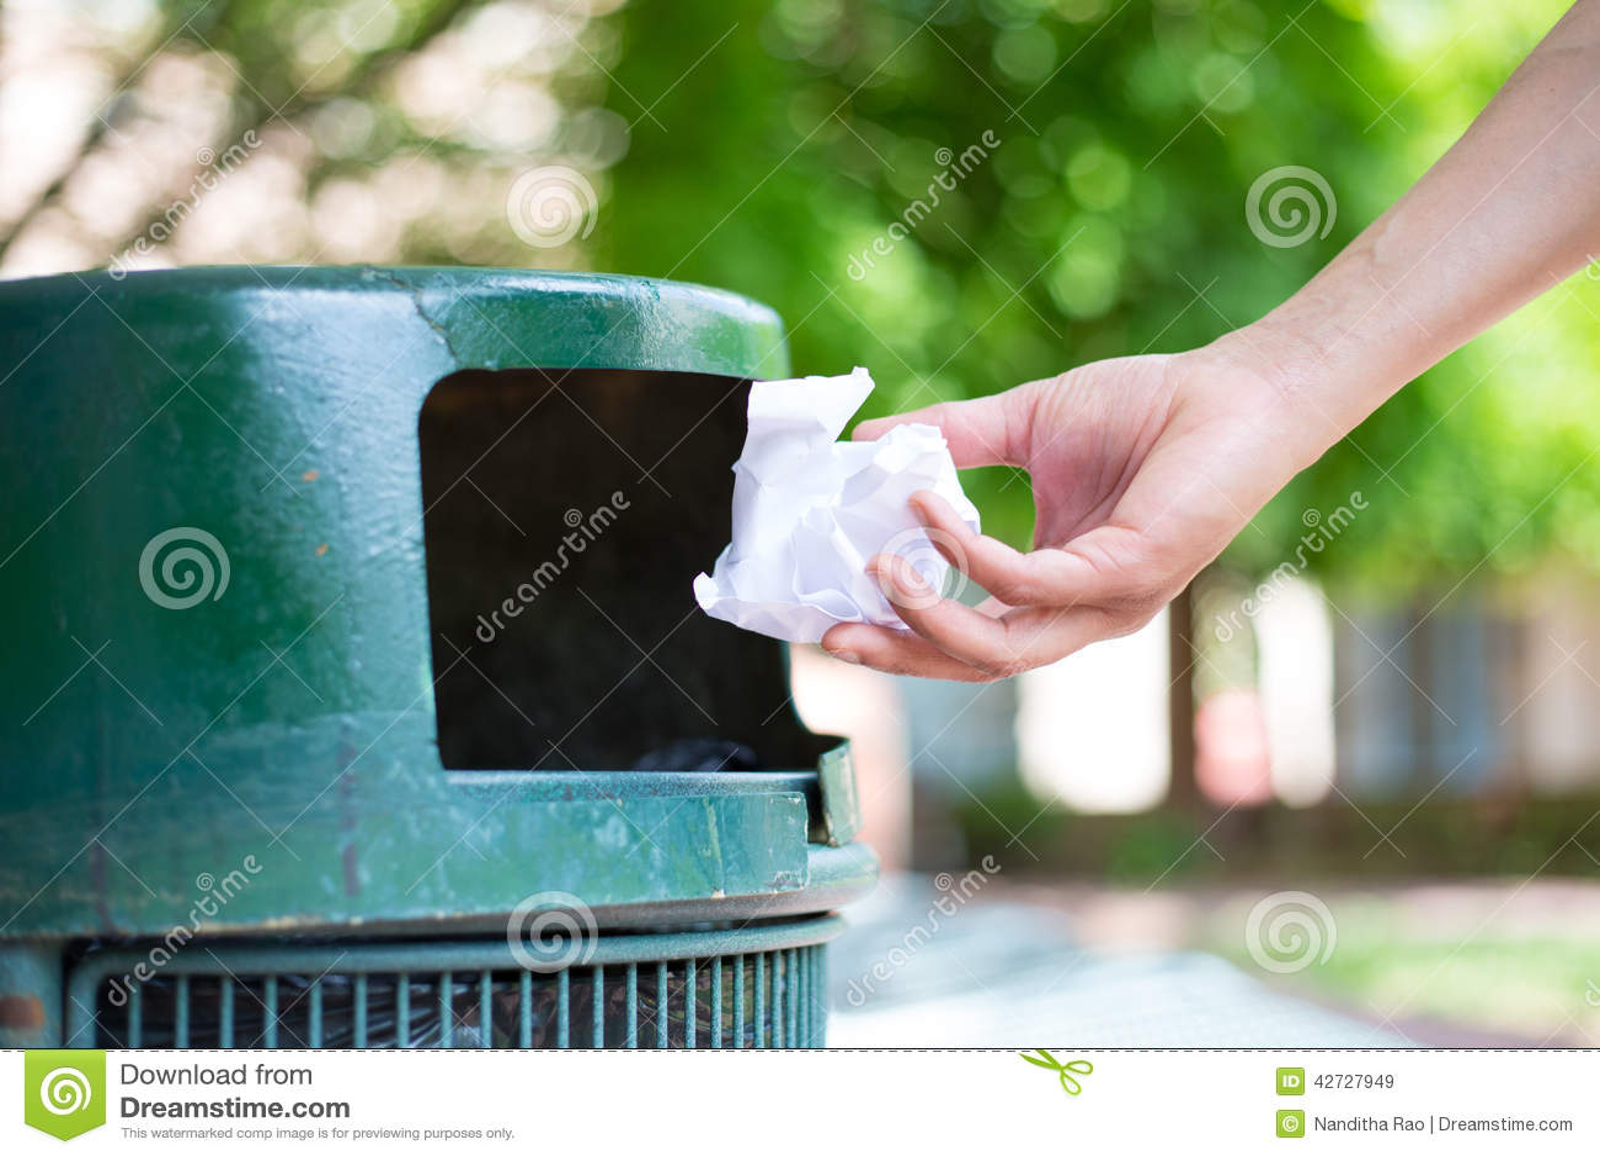 Throwing Away Trash Stock Image Image Of Cancel Filing